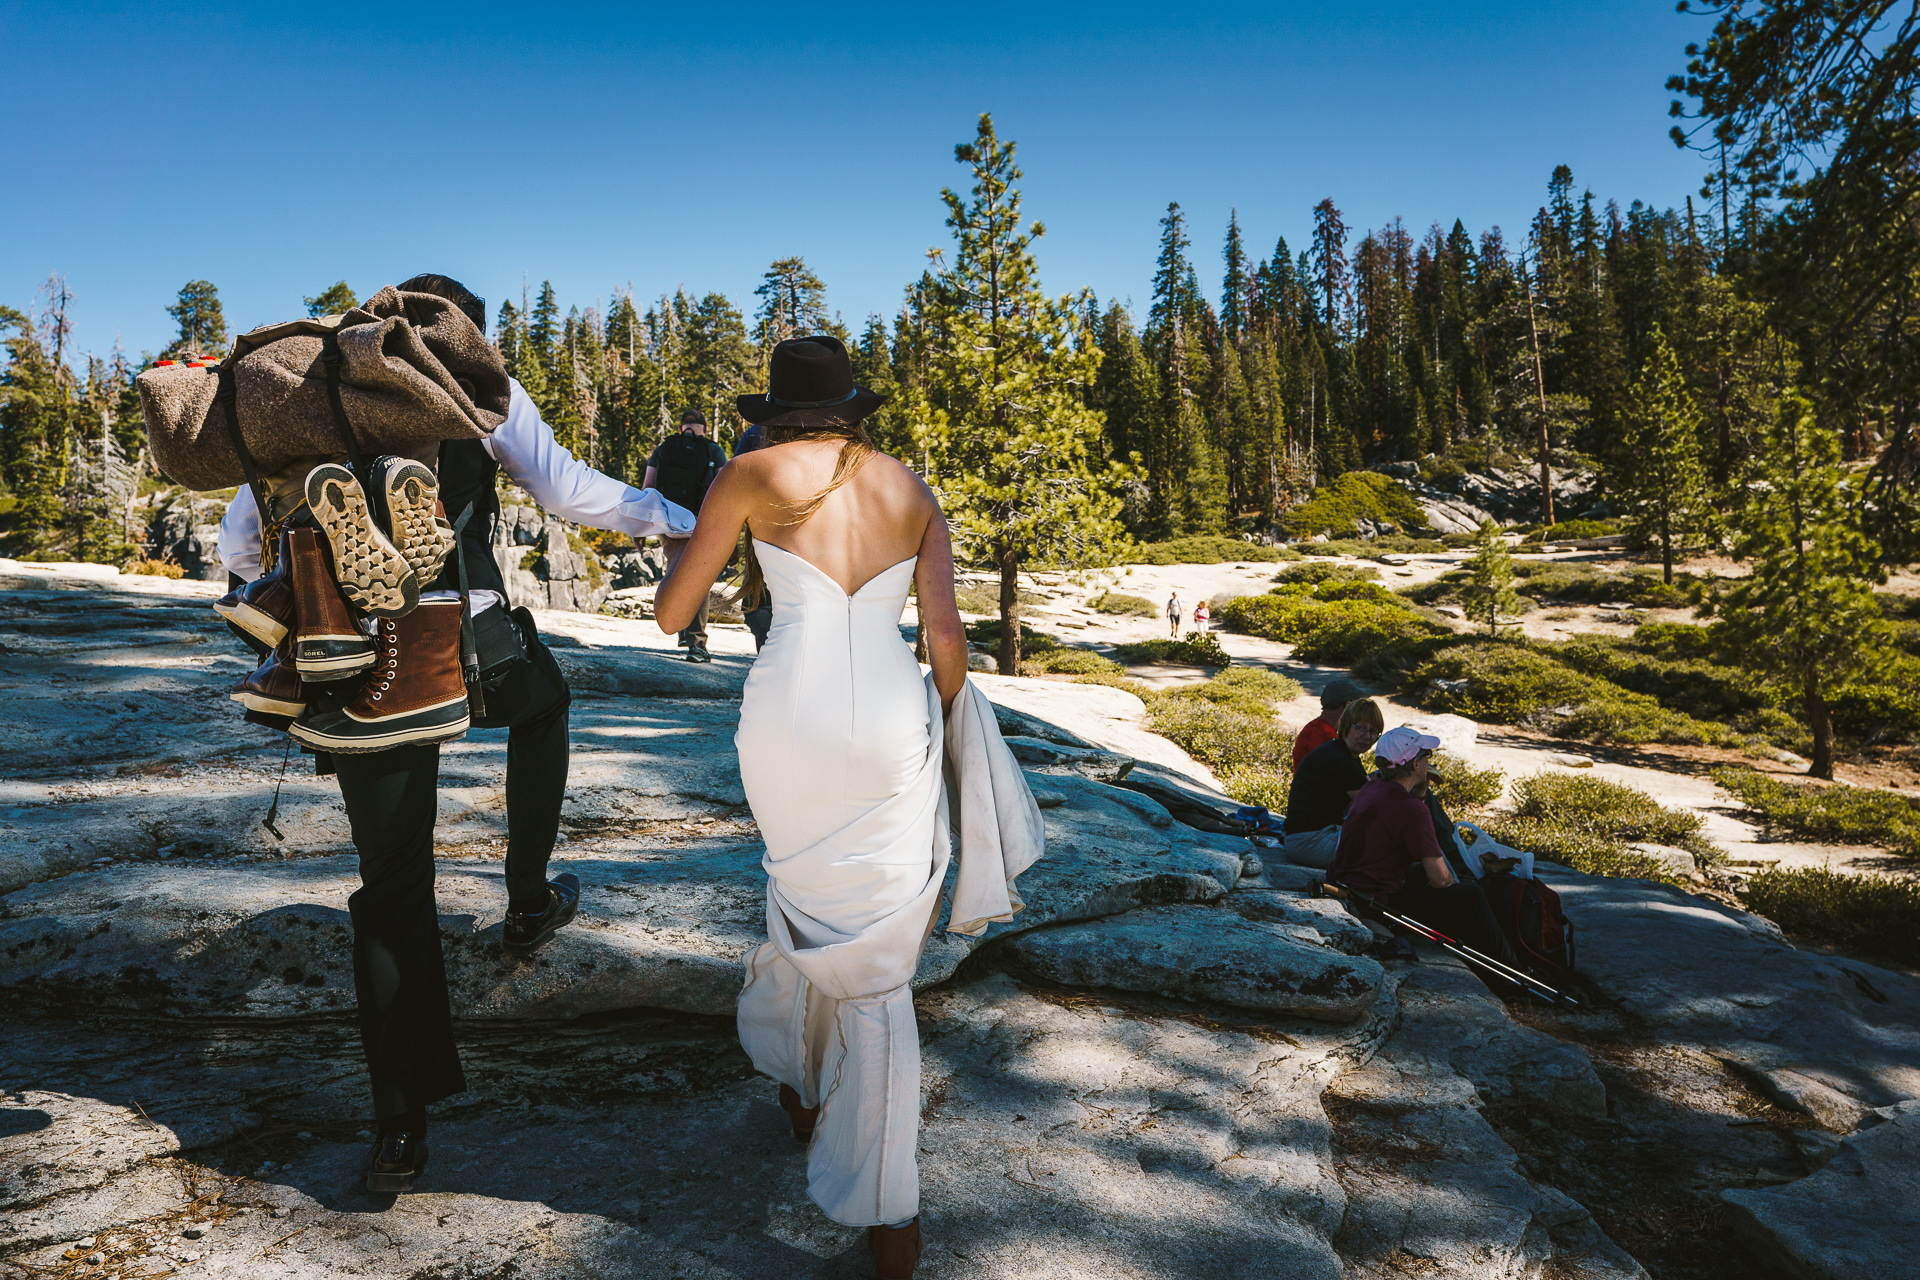 Two15-16-adventure-yosmite-wedding.jpg